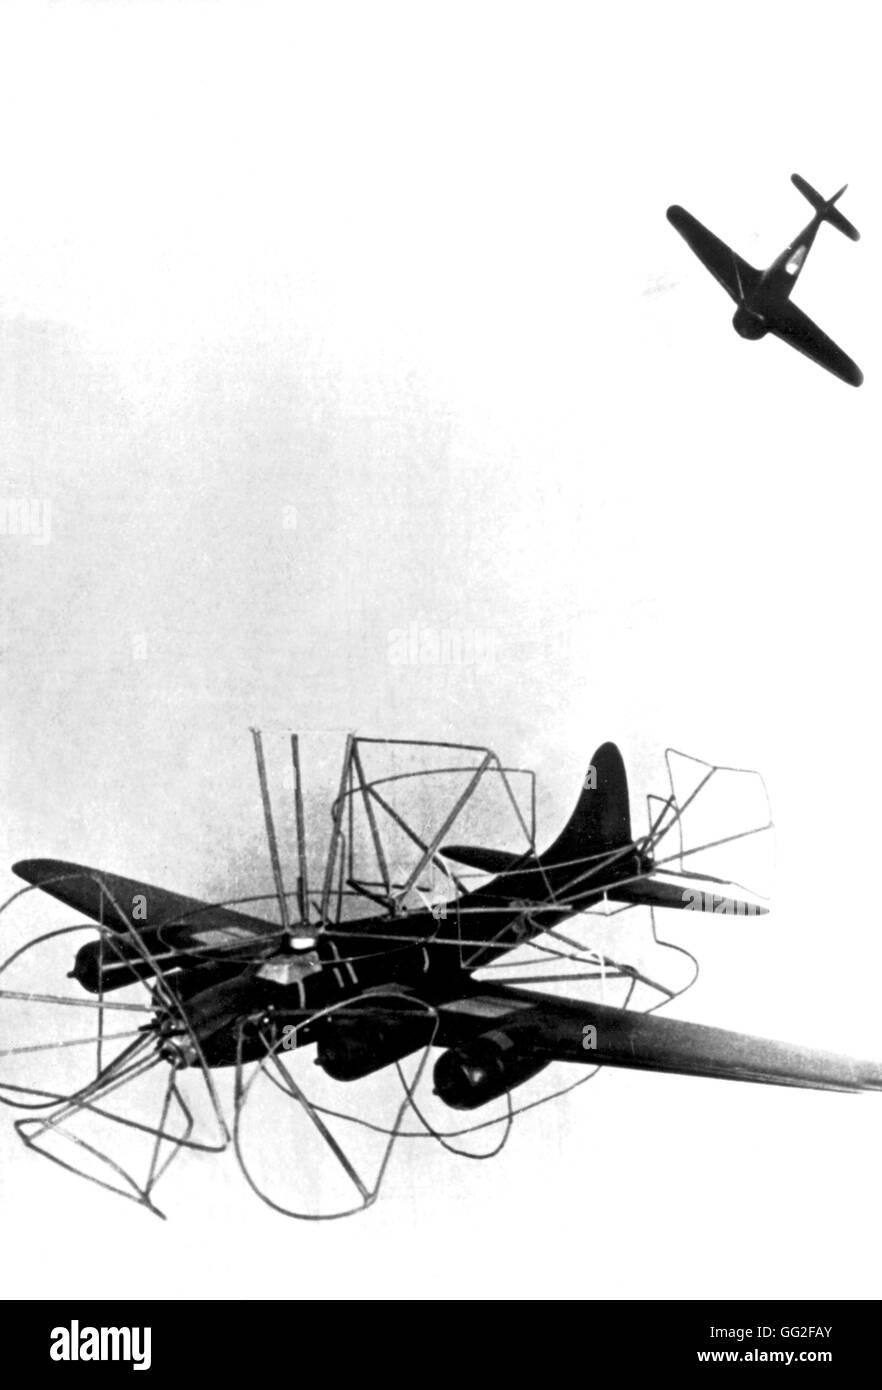 Focke Wulf 190 and Boeing Bit aircrafts February 1944 World War II Paris. Bibliothèque nationale - Stock Image